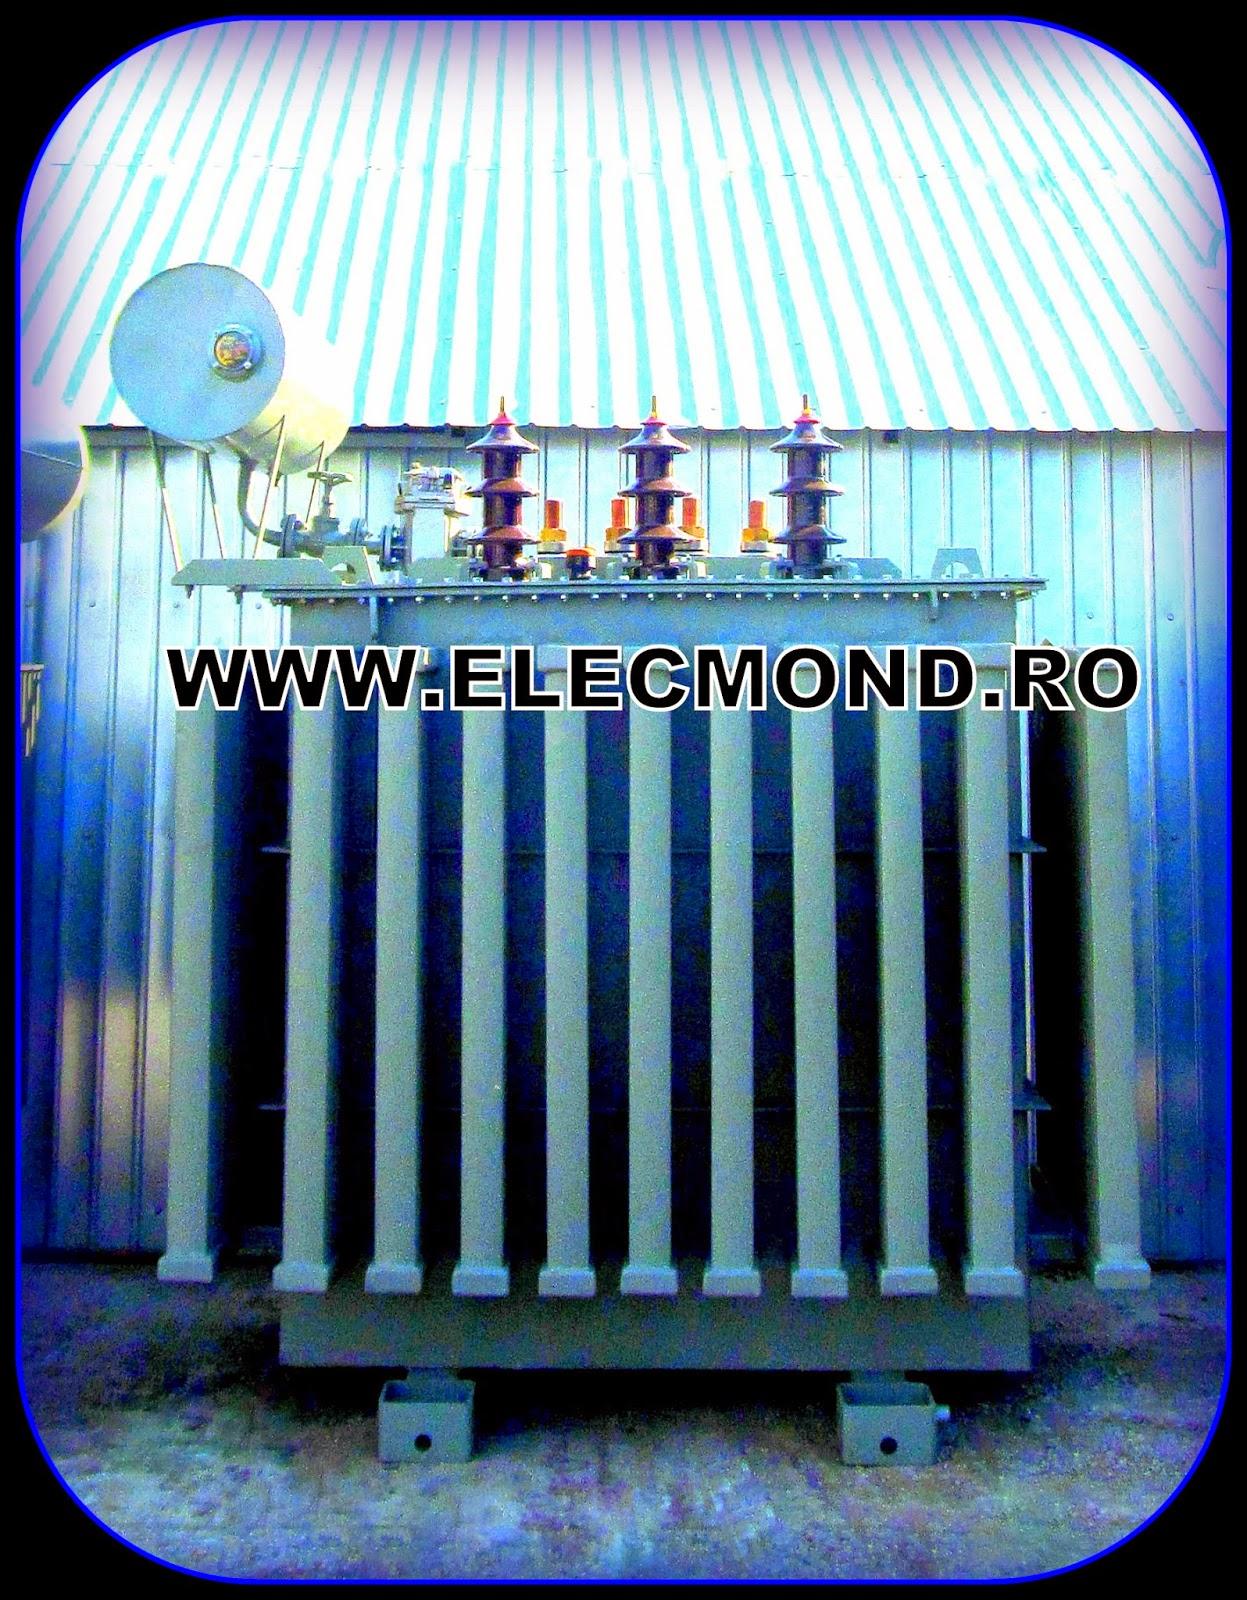 Transformator 1000  , transformator 1000 kVA , transformator 1600 kVA , transformatoare din stoc , transformatoare pe stoc , transformatoare ELECMOND ELECTRIC CRAIOVA  , ELECMOND BLOG